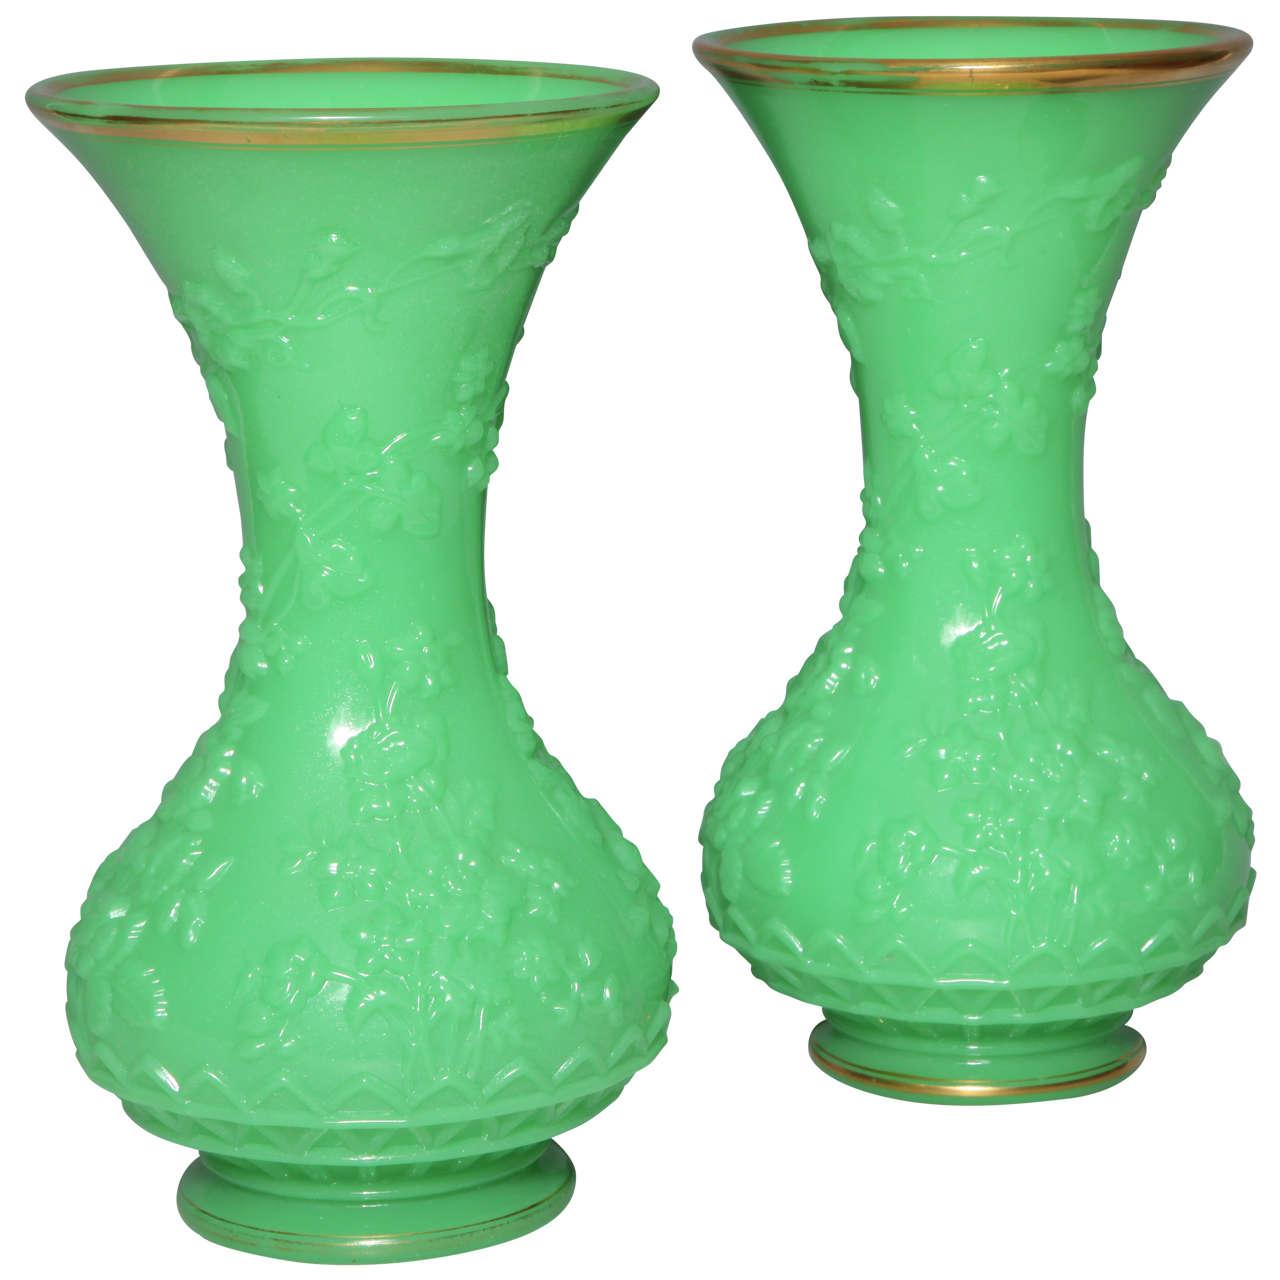 Freanch Opaline Glass